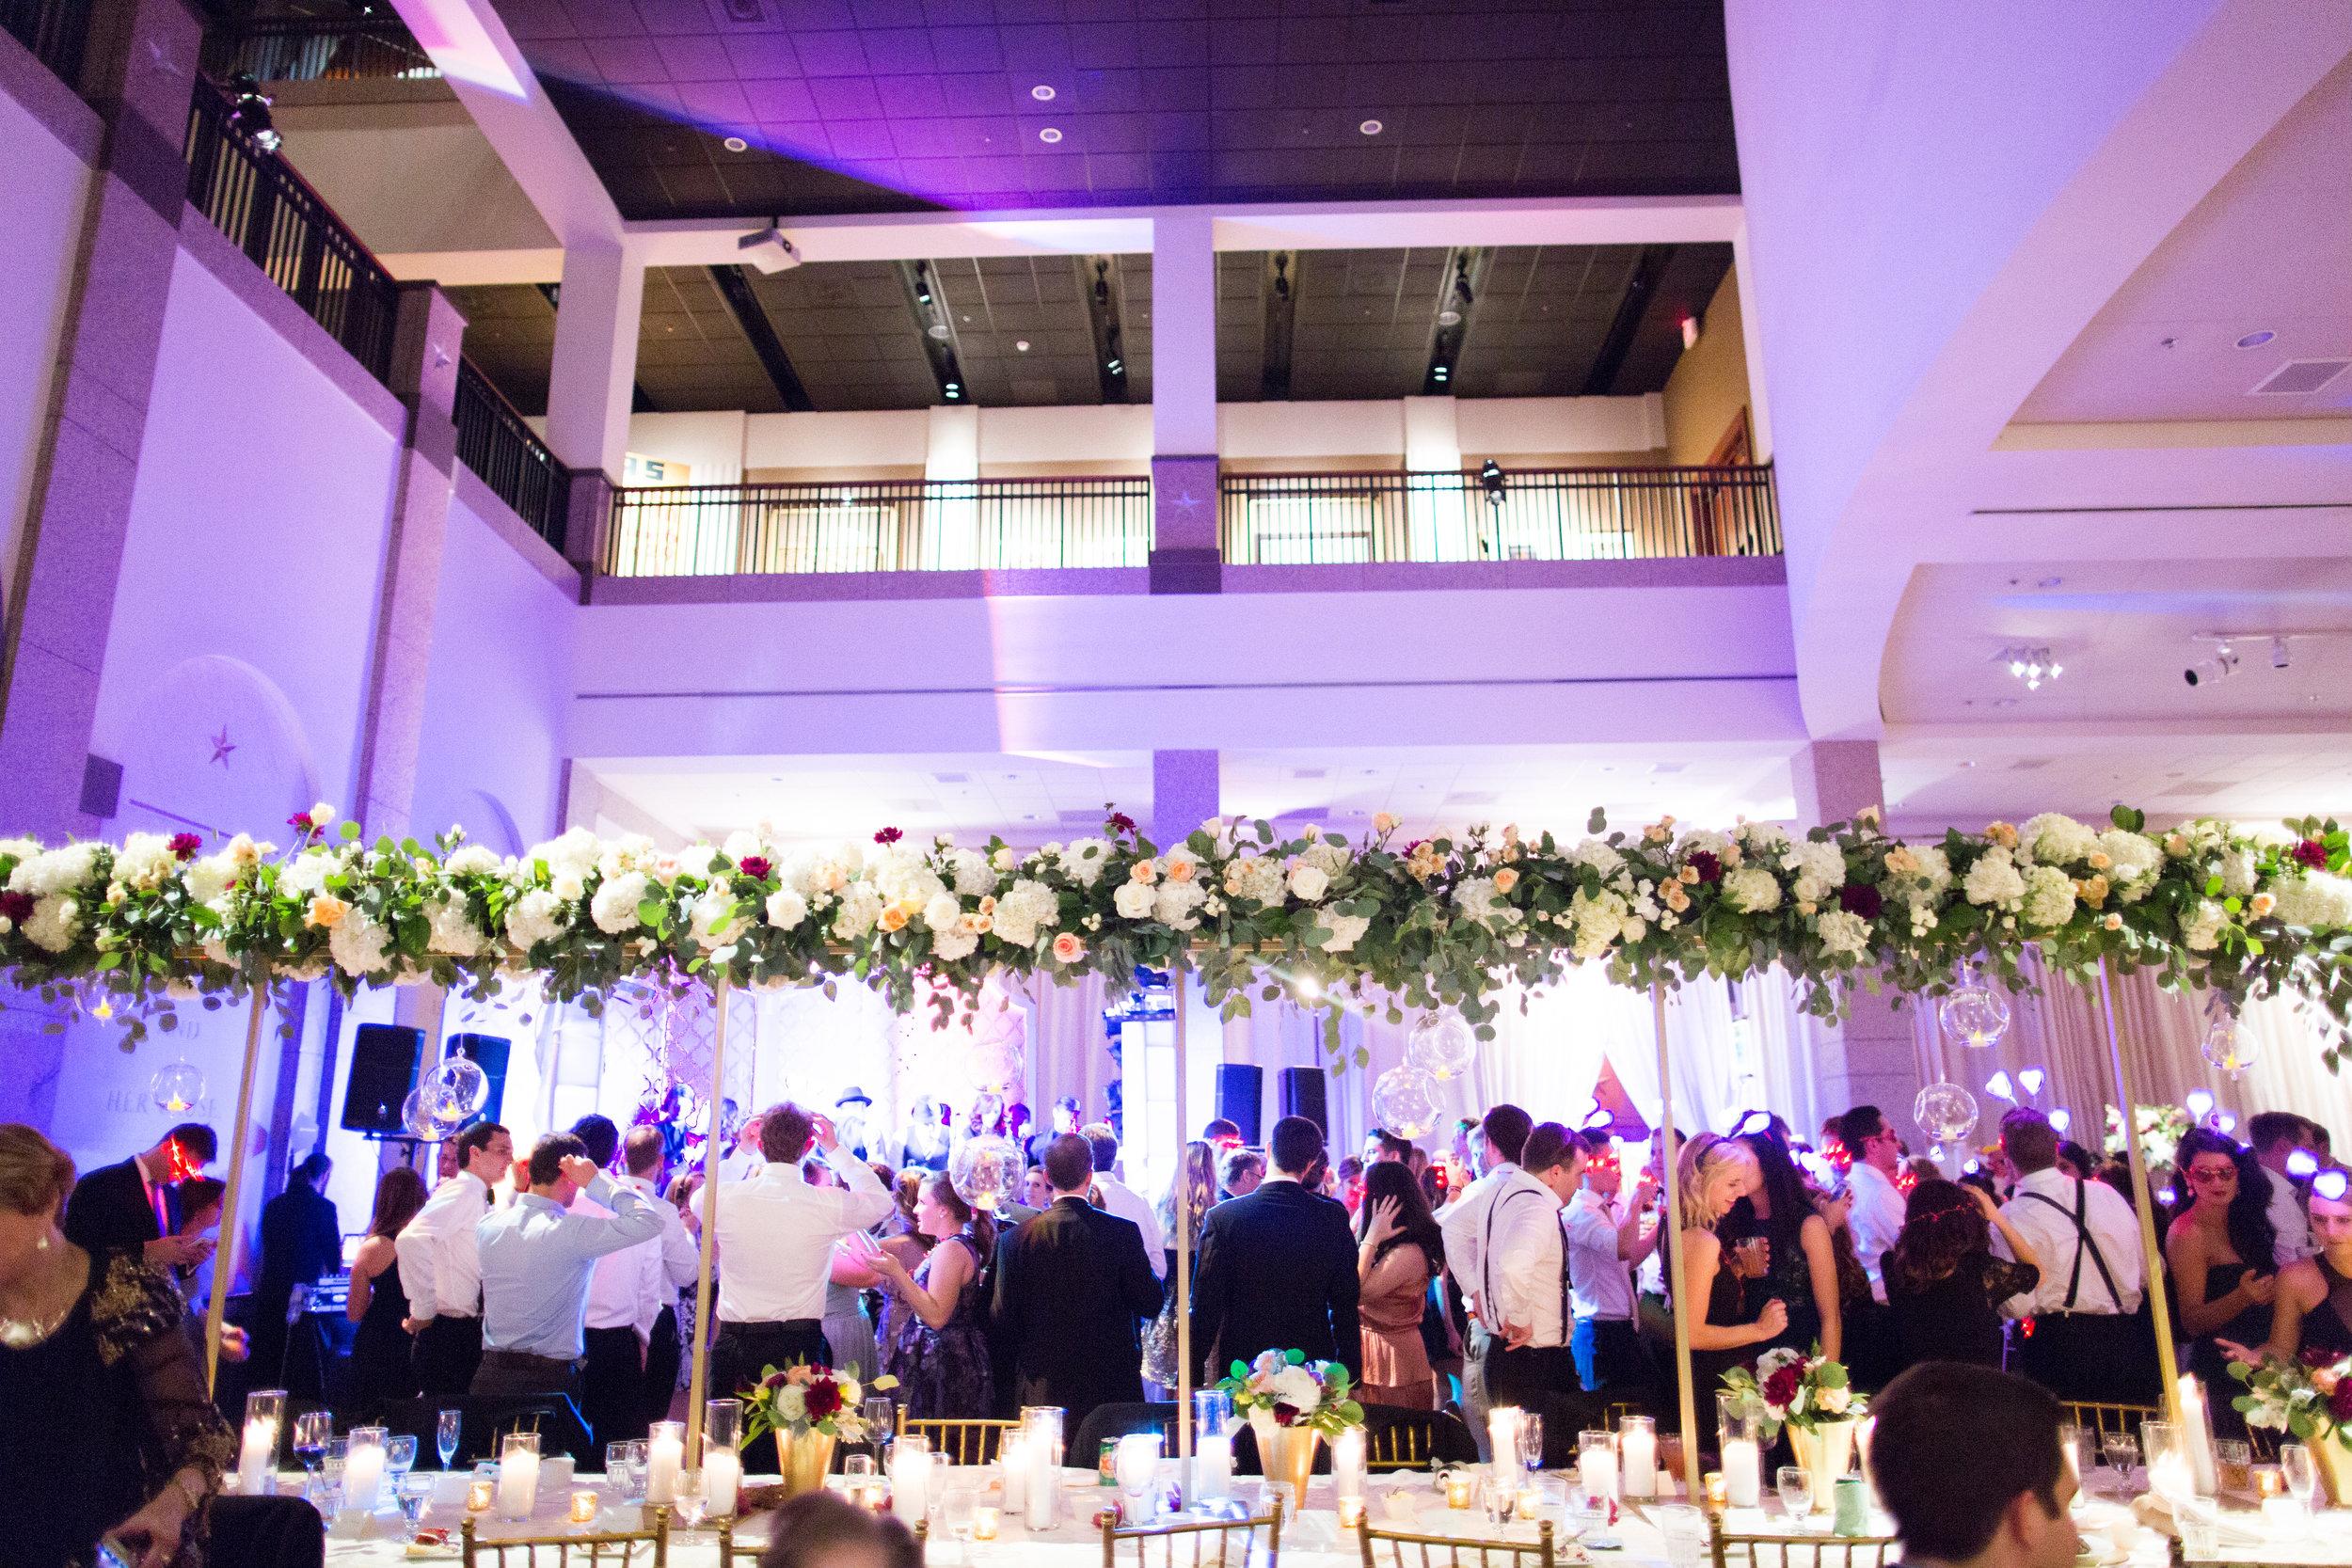 caroline_events_destination_wedding_planner_austin_bullock_museum_wedding26.JPG